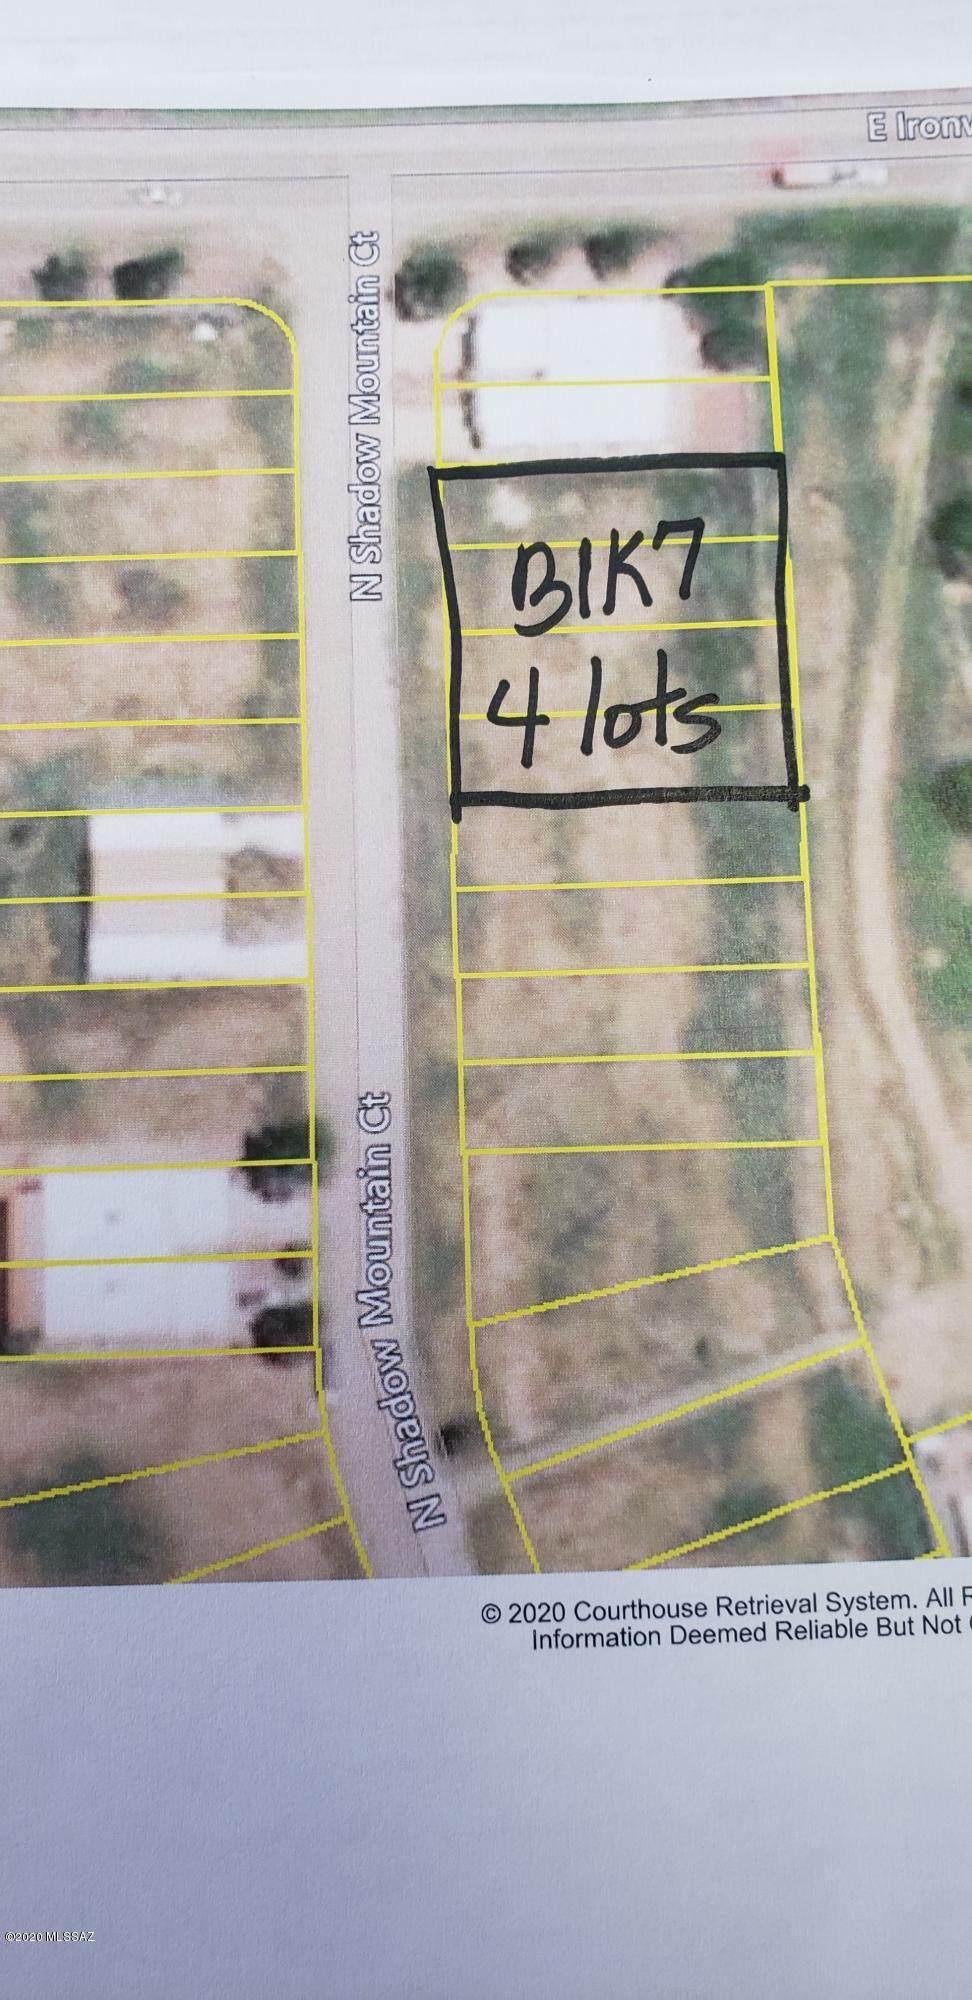 TDB Shadow Mountain 4 Lots Blk 7 Court - Photo 1